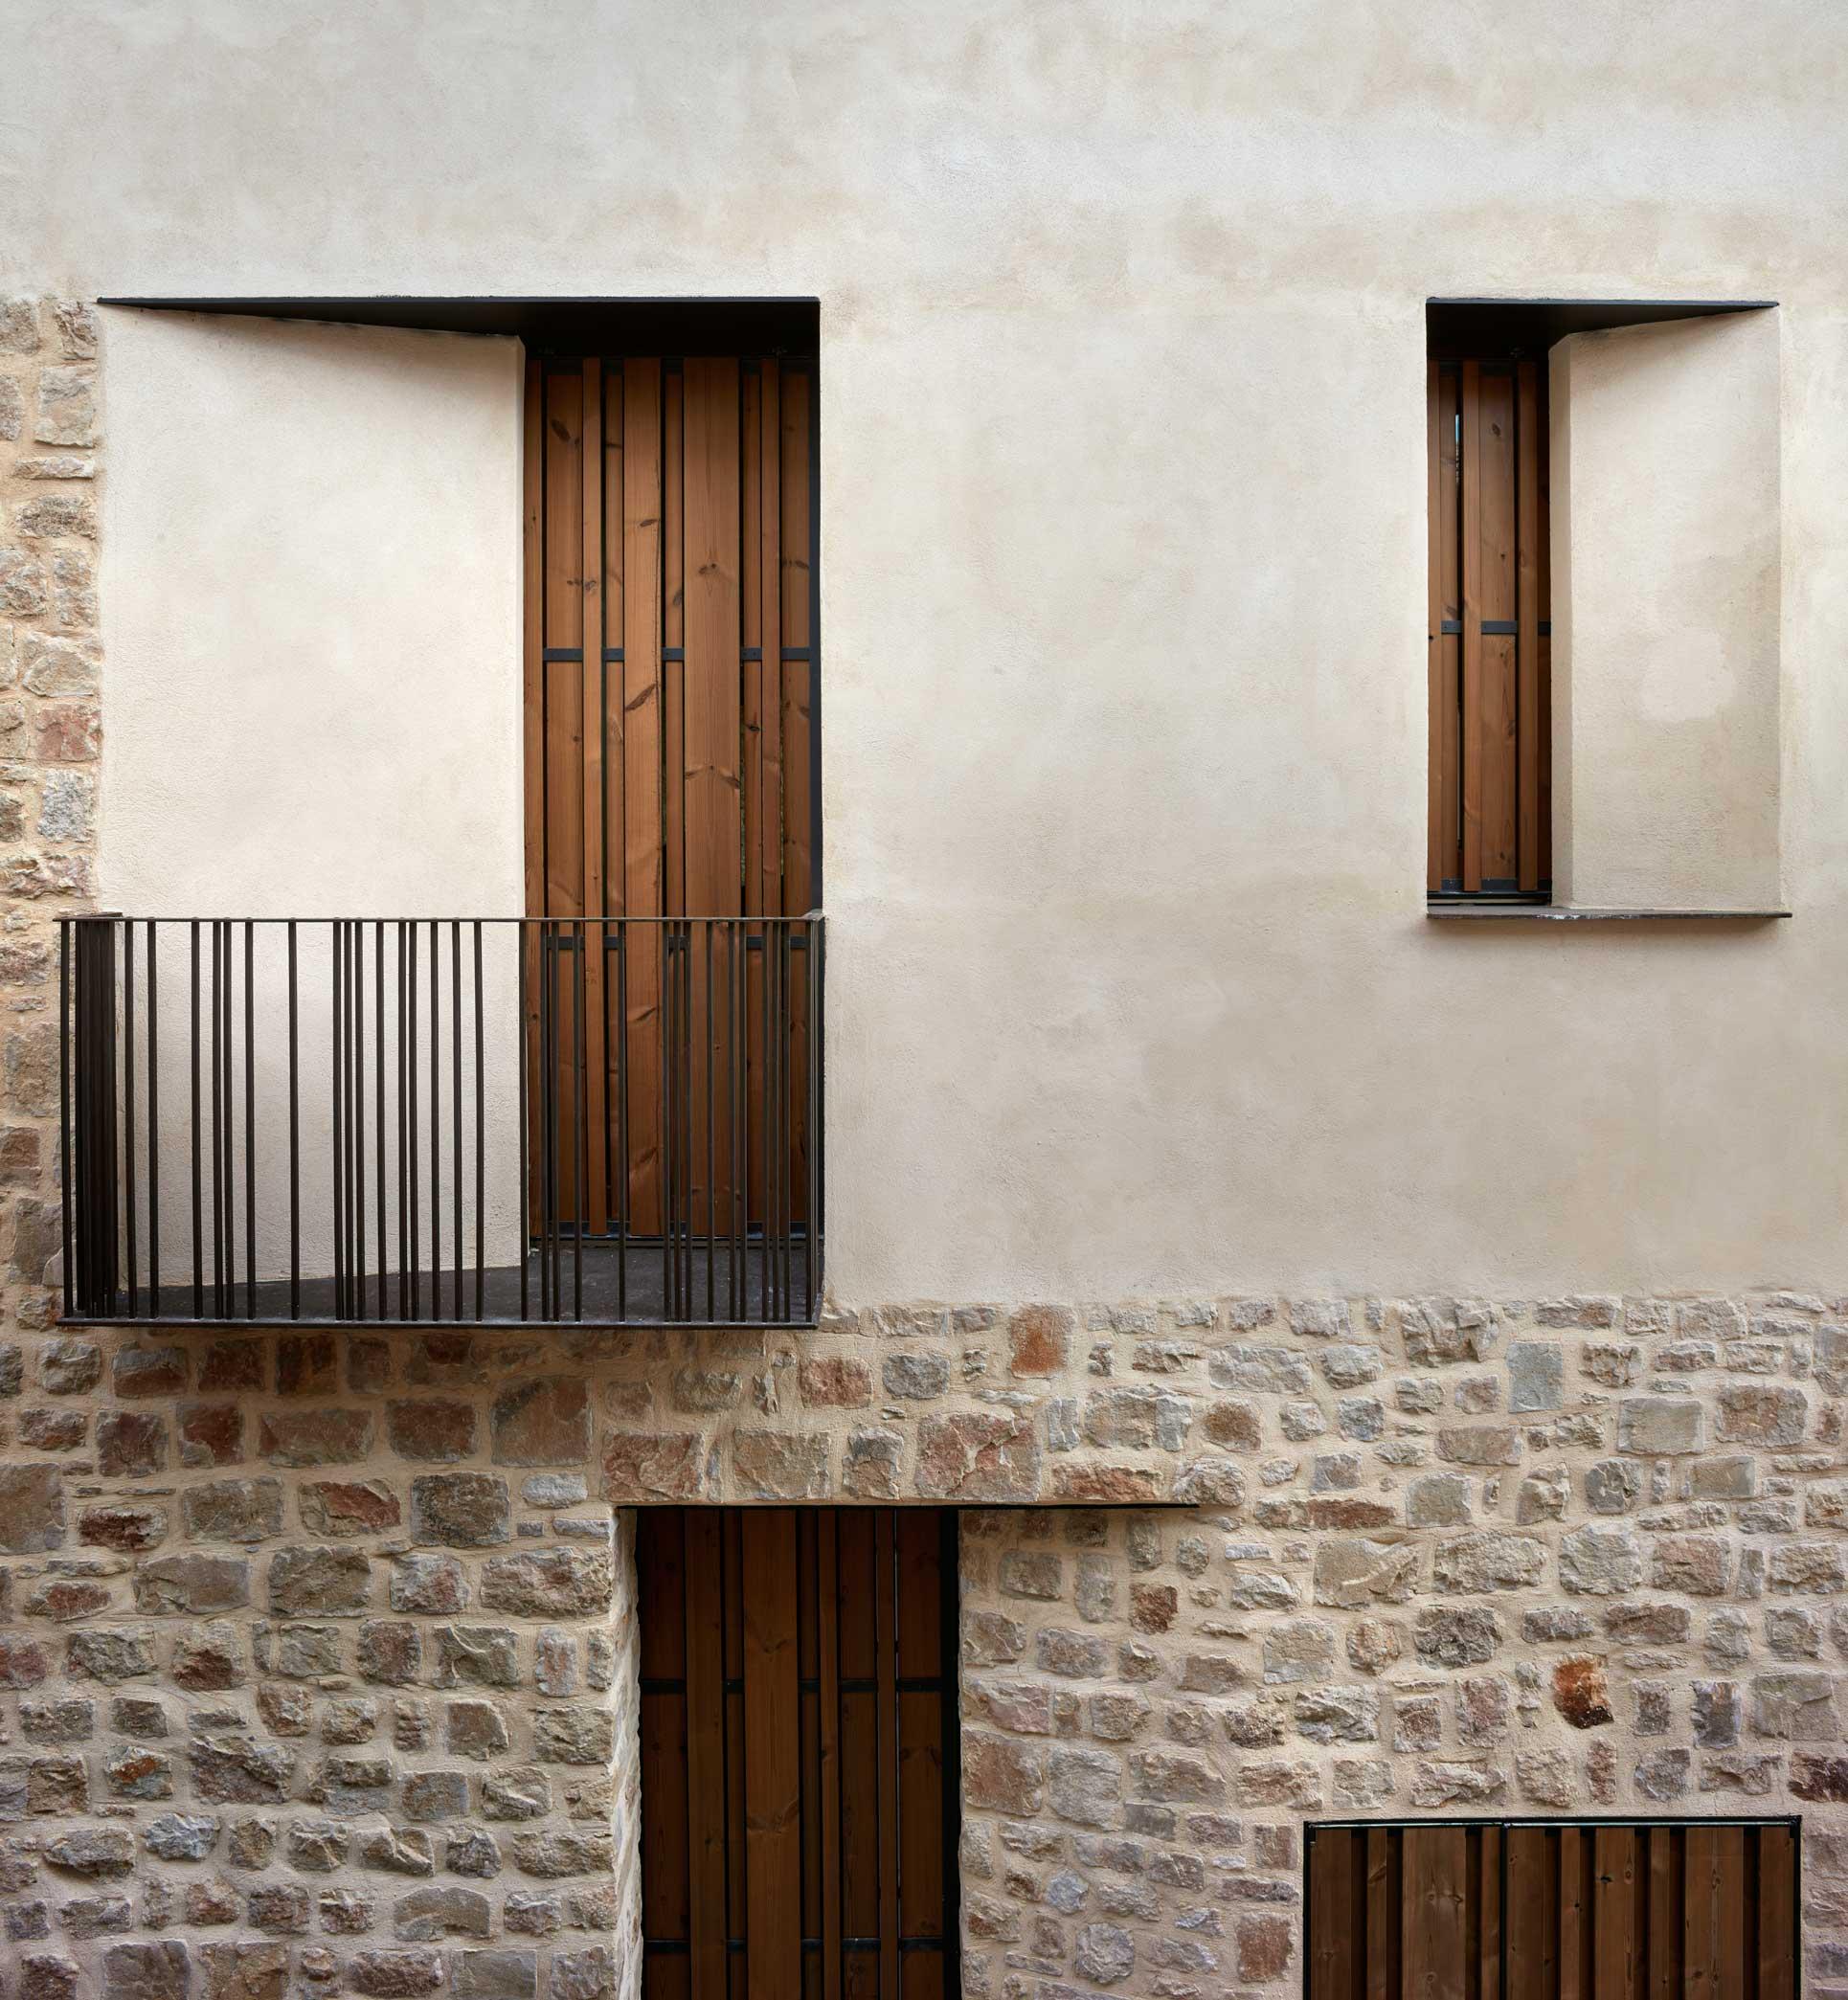 A Traditional Iberian House, Ramon Esteve's Rural Paradise ramon esteve A Traditional Iberian House, Ramon Esteve's Rural Paradise Rubielos 07